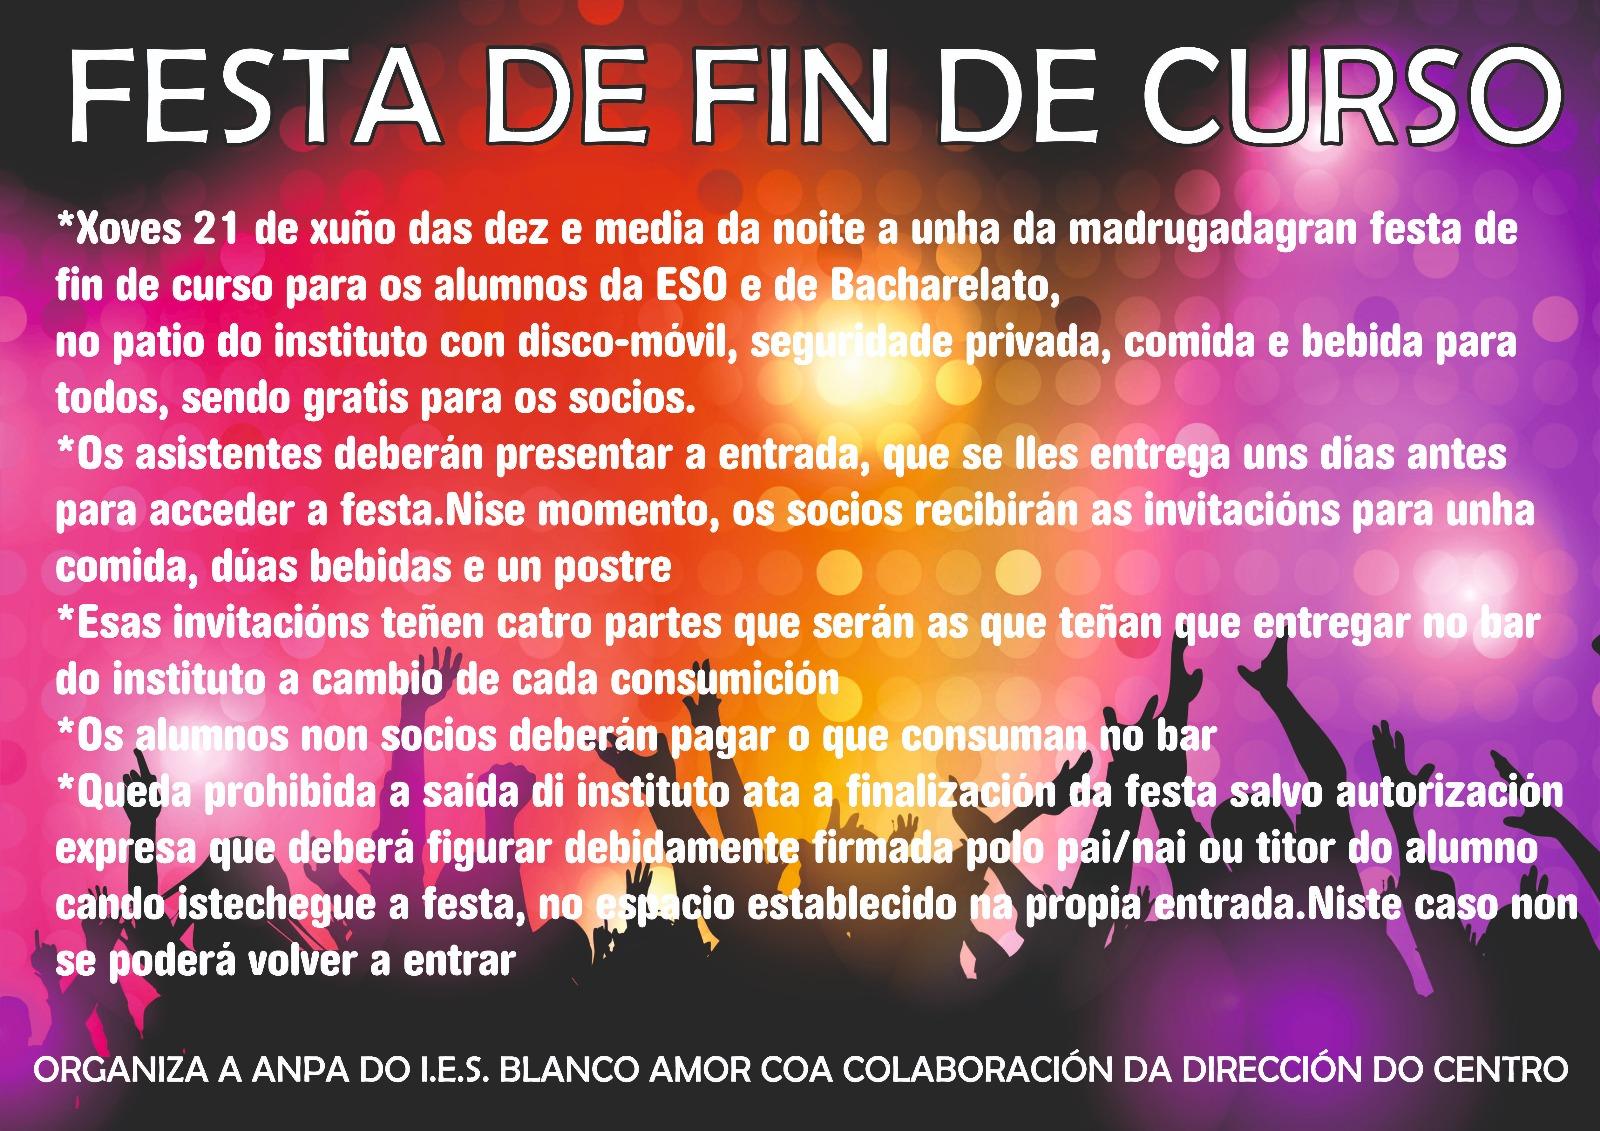 Anpablancoamor Revista Festa Fin De Curso